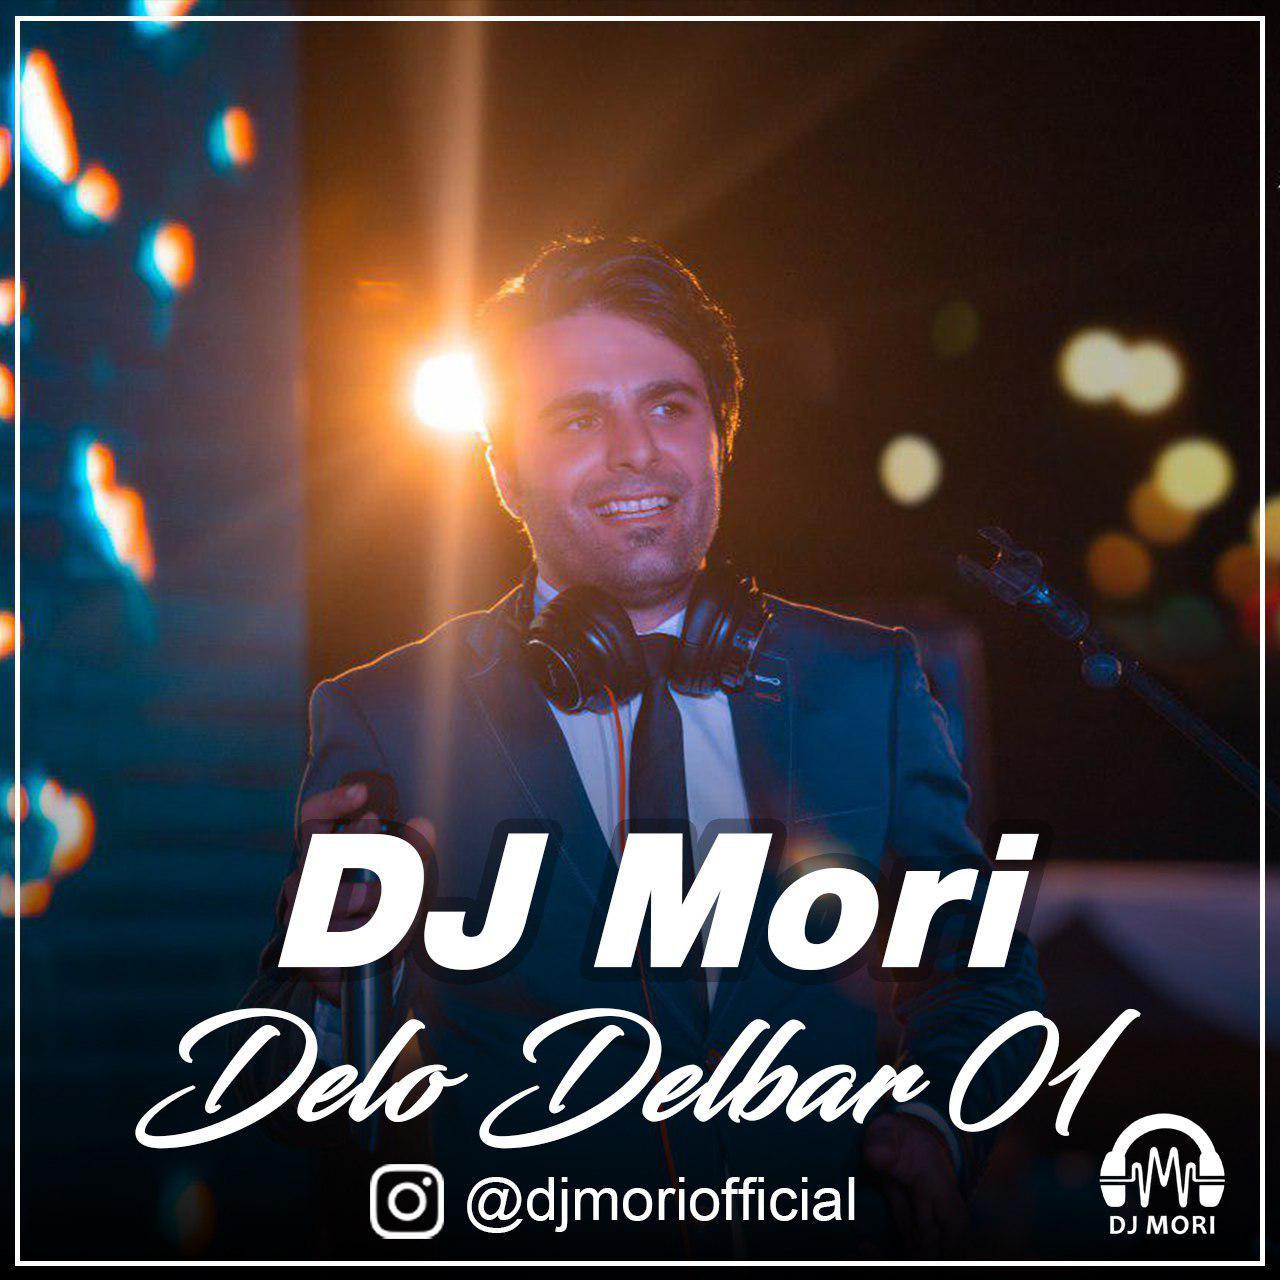 DJ Mori – Delo Delbar 01